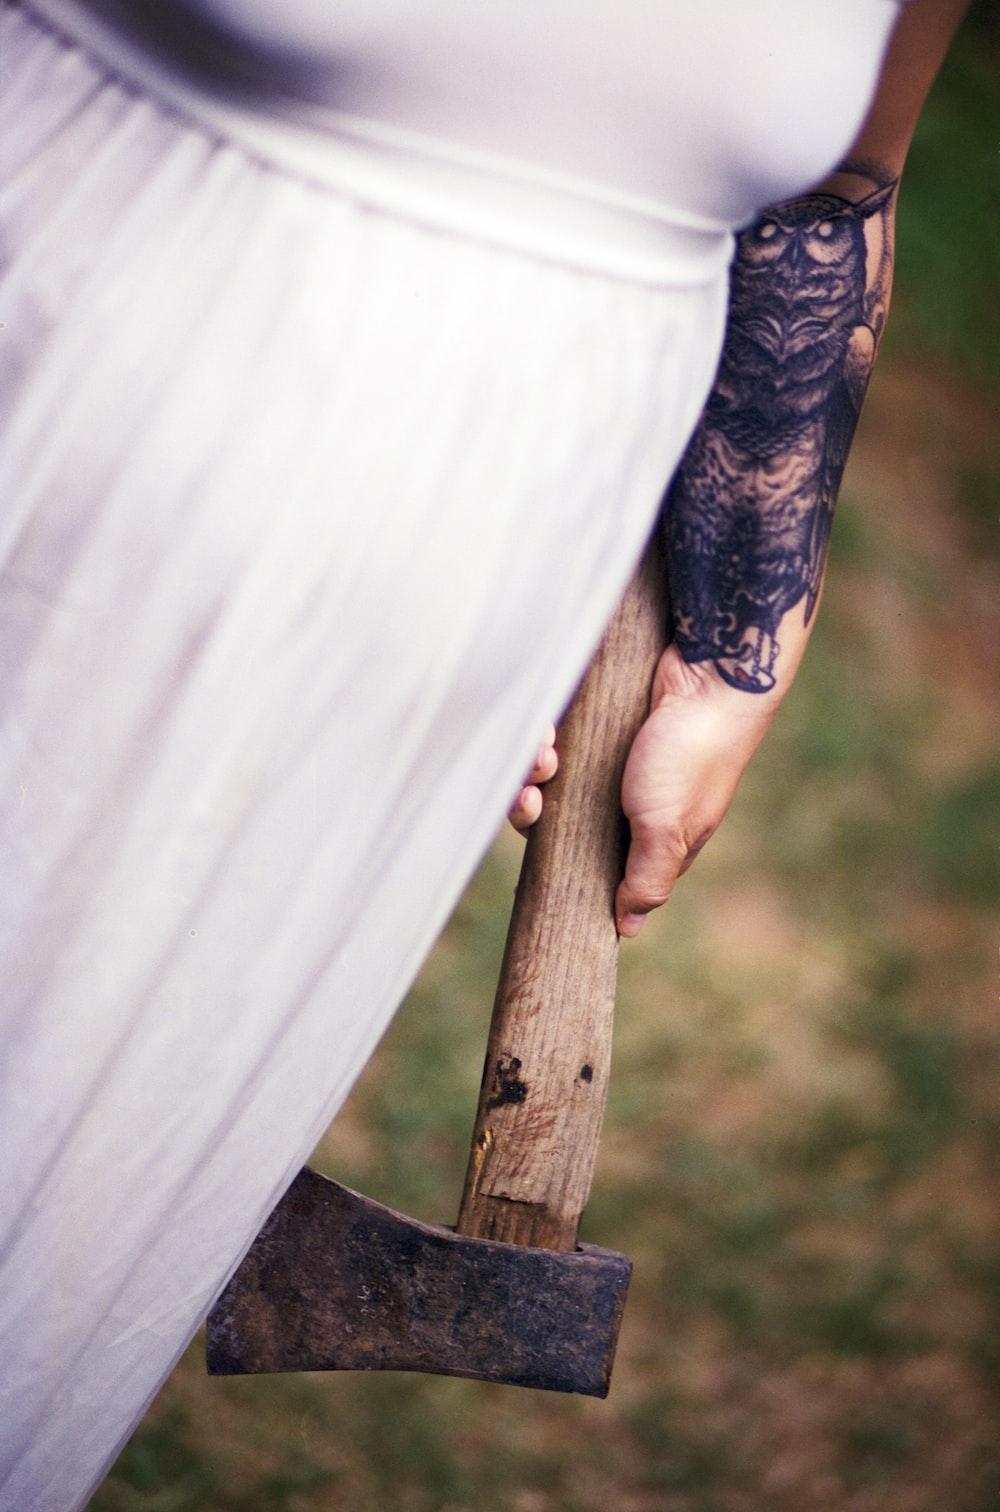 woman wearing white shirt holding axe